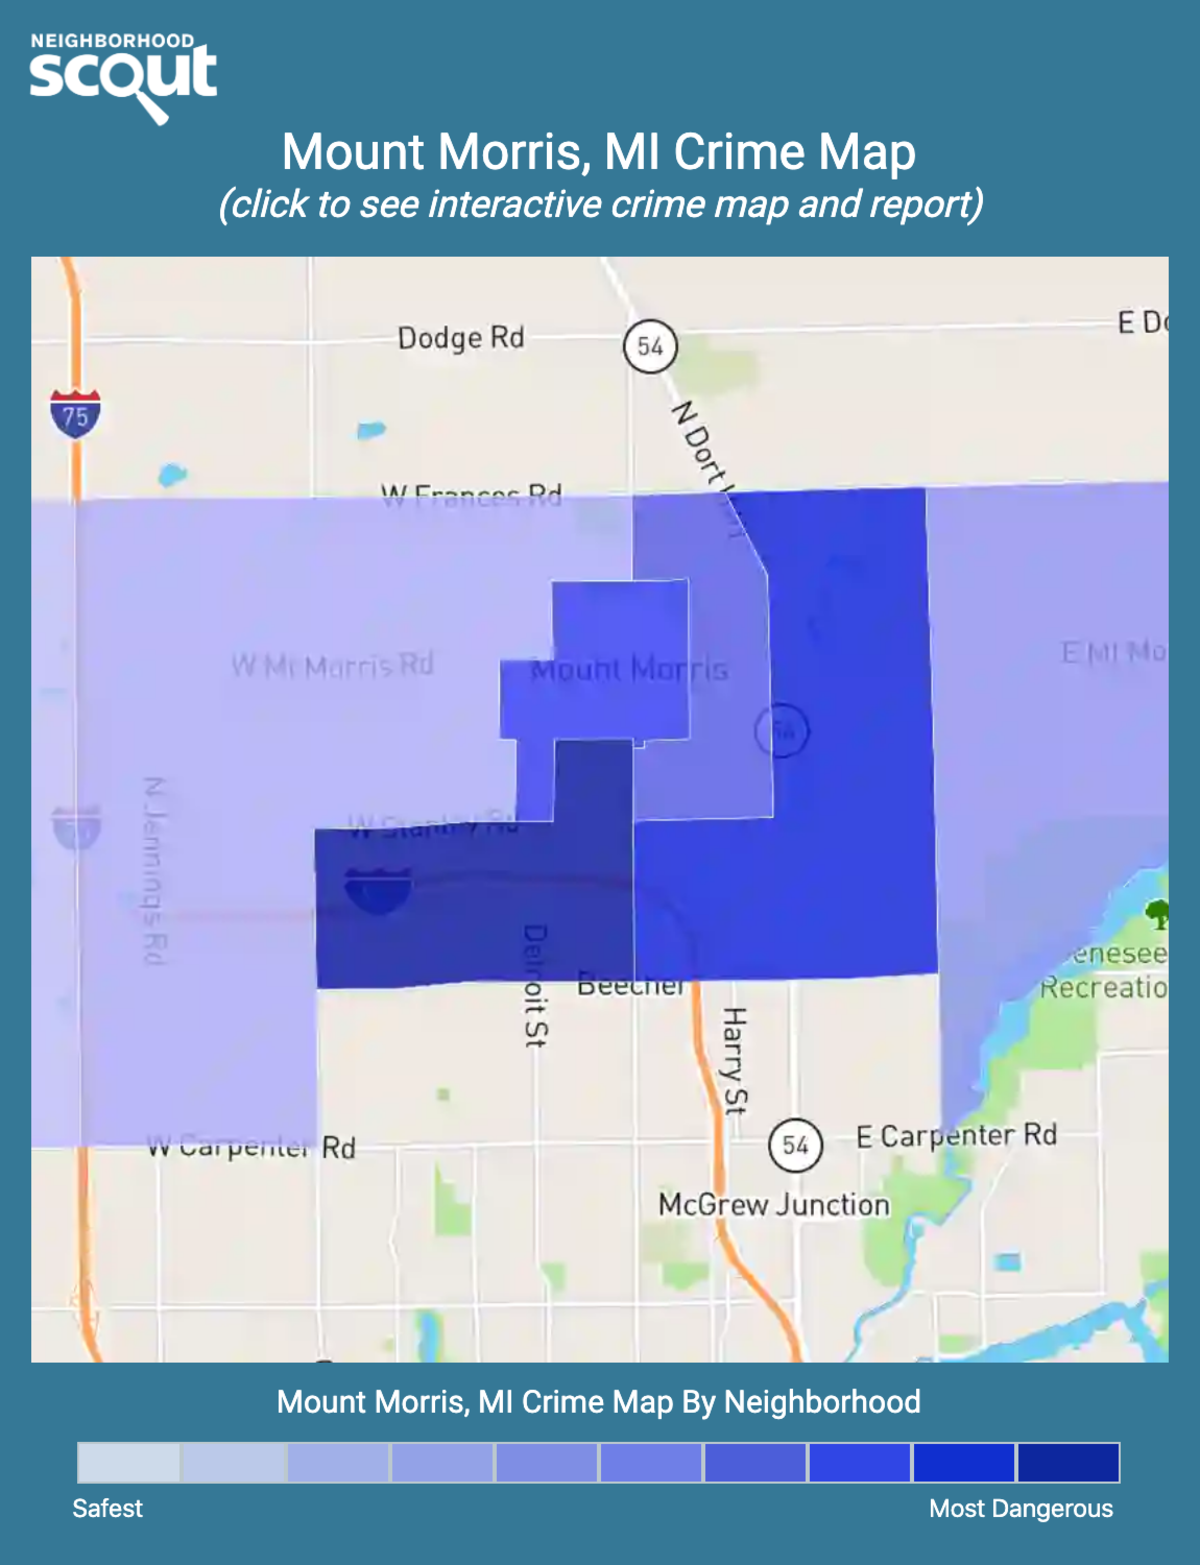 Mount Morris, Michigan crime map